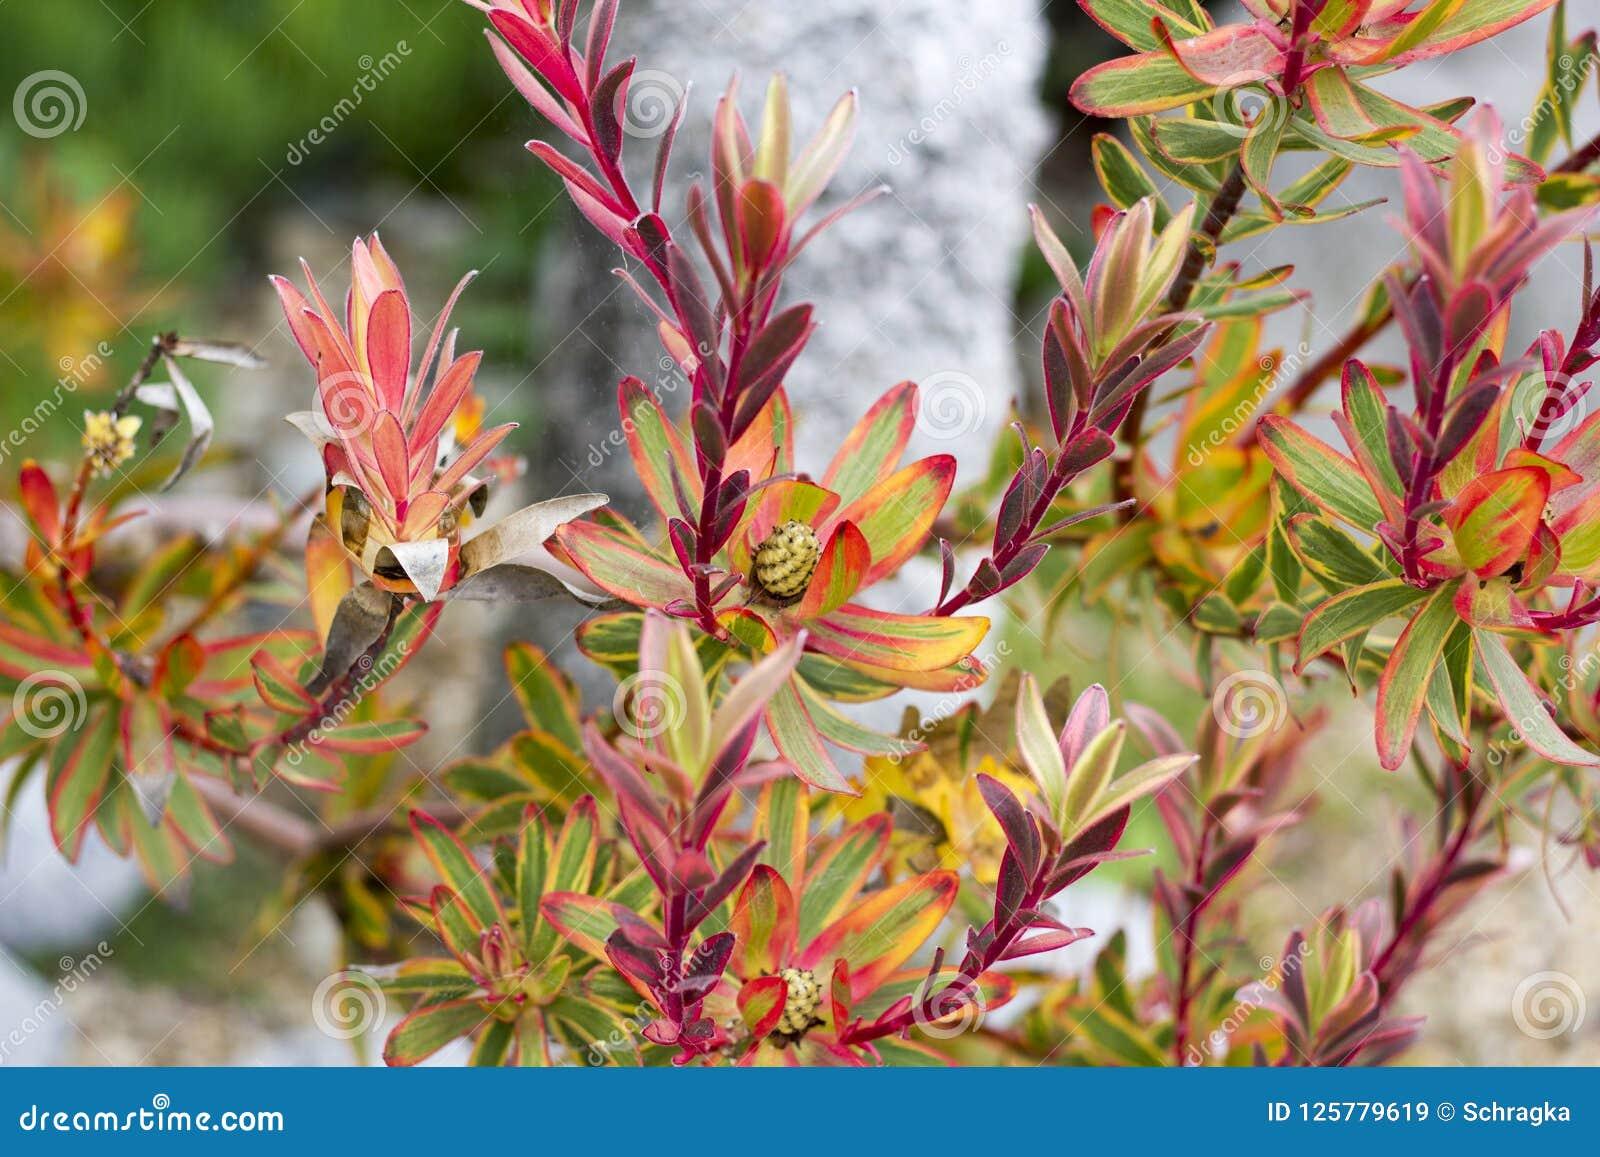 Horizontal photo of red & green leaf bush